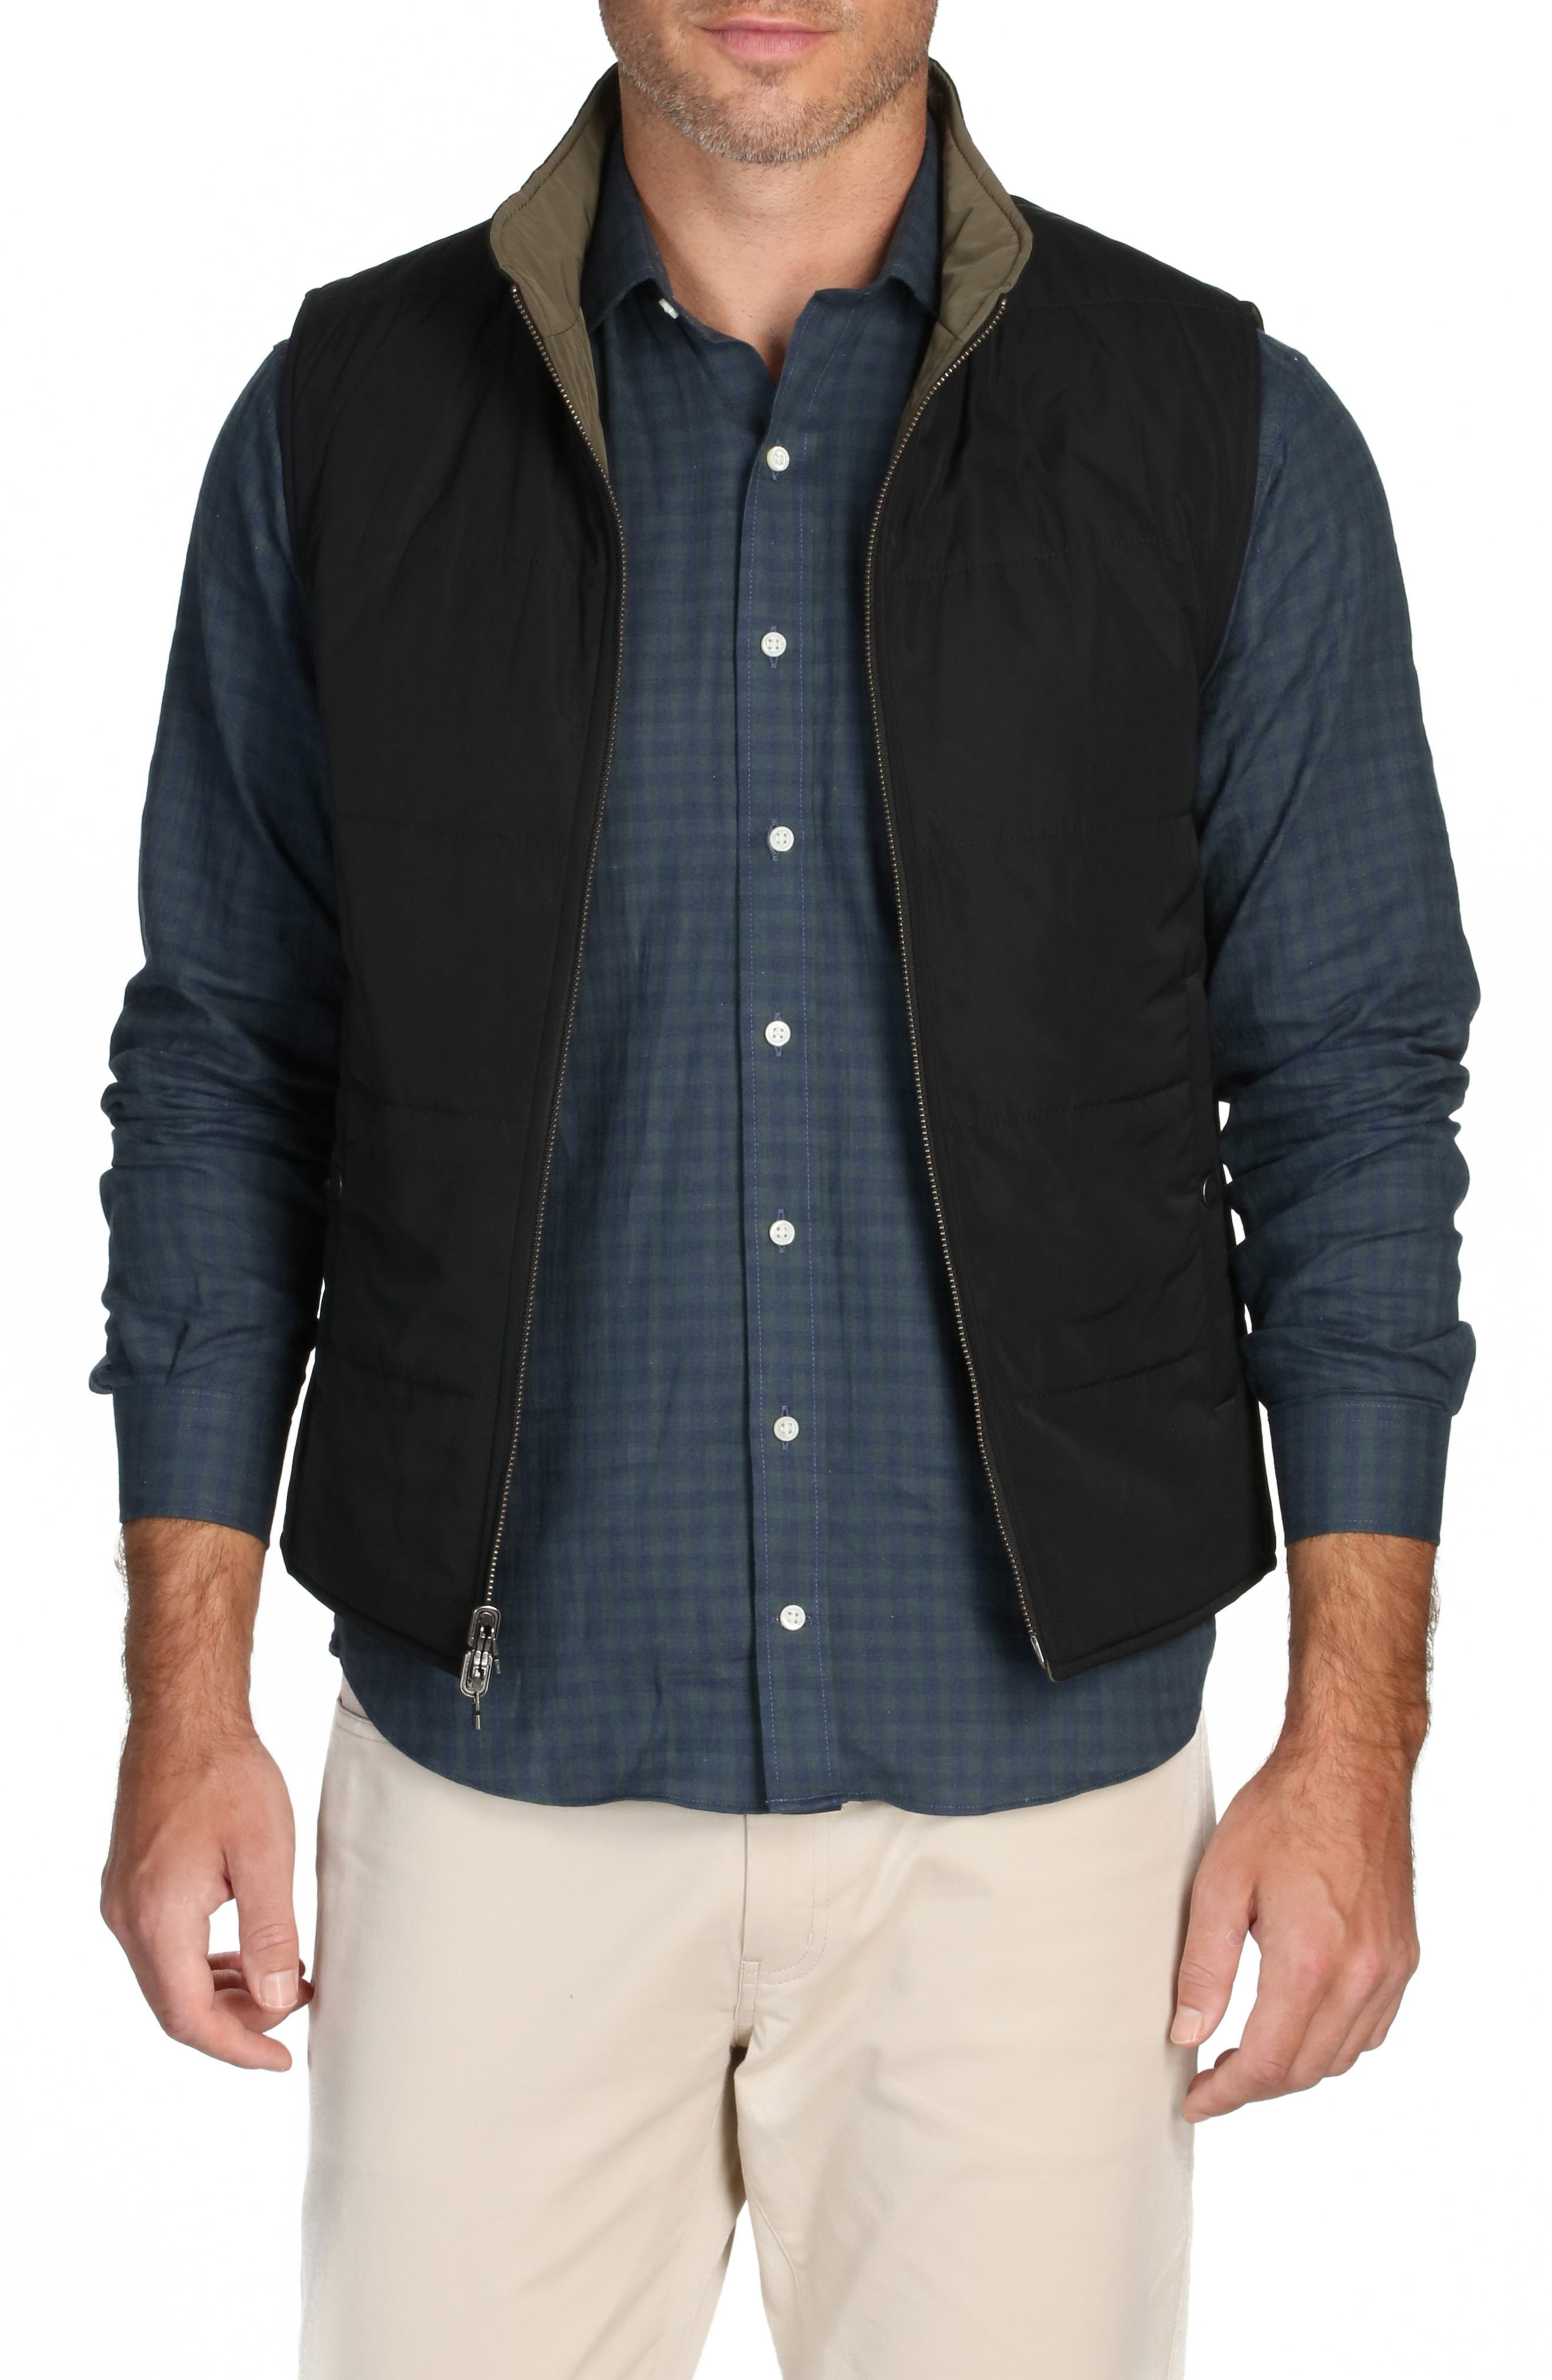 Mcfly Water Resistant Reversible Vest